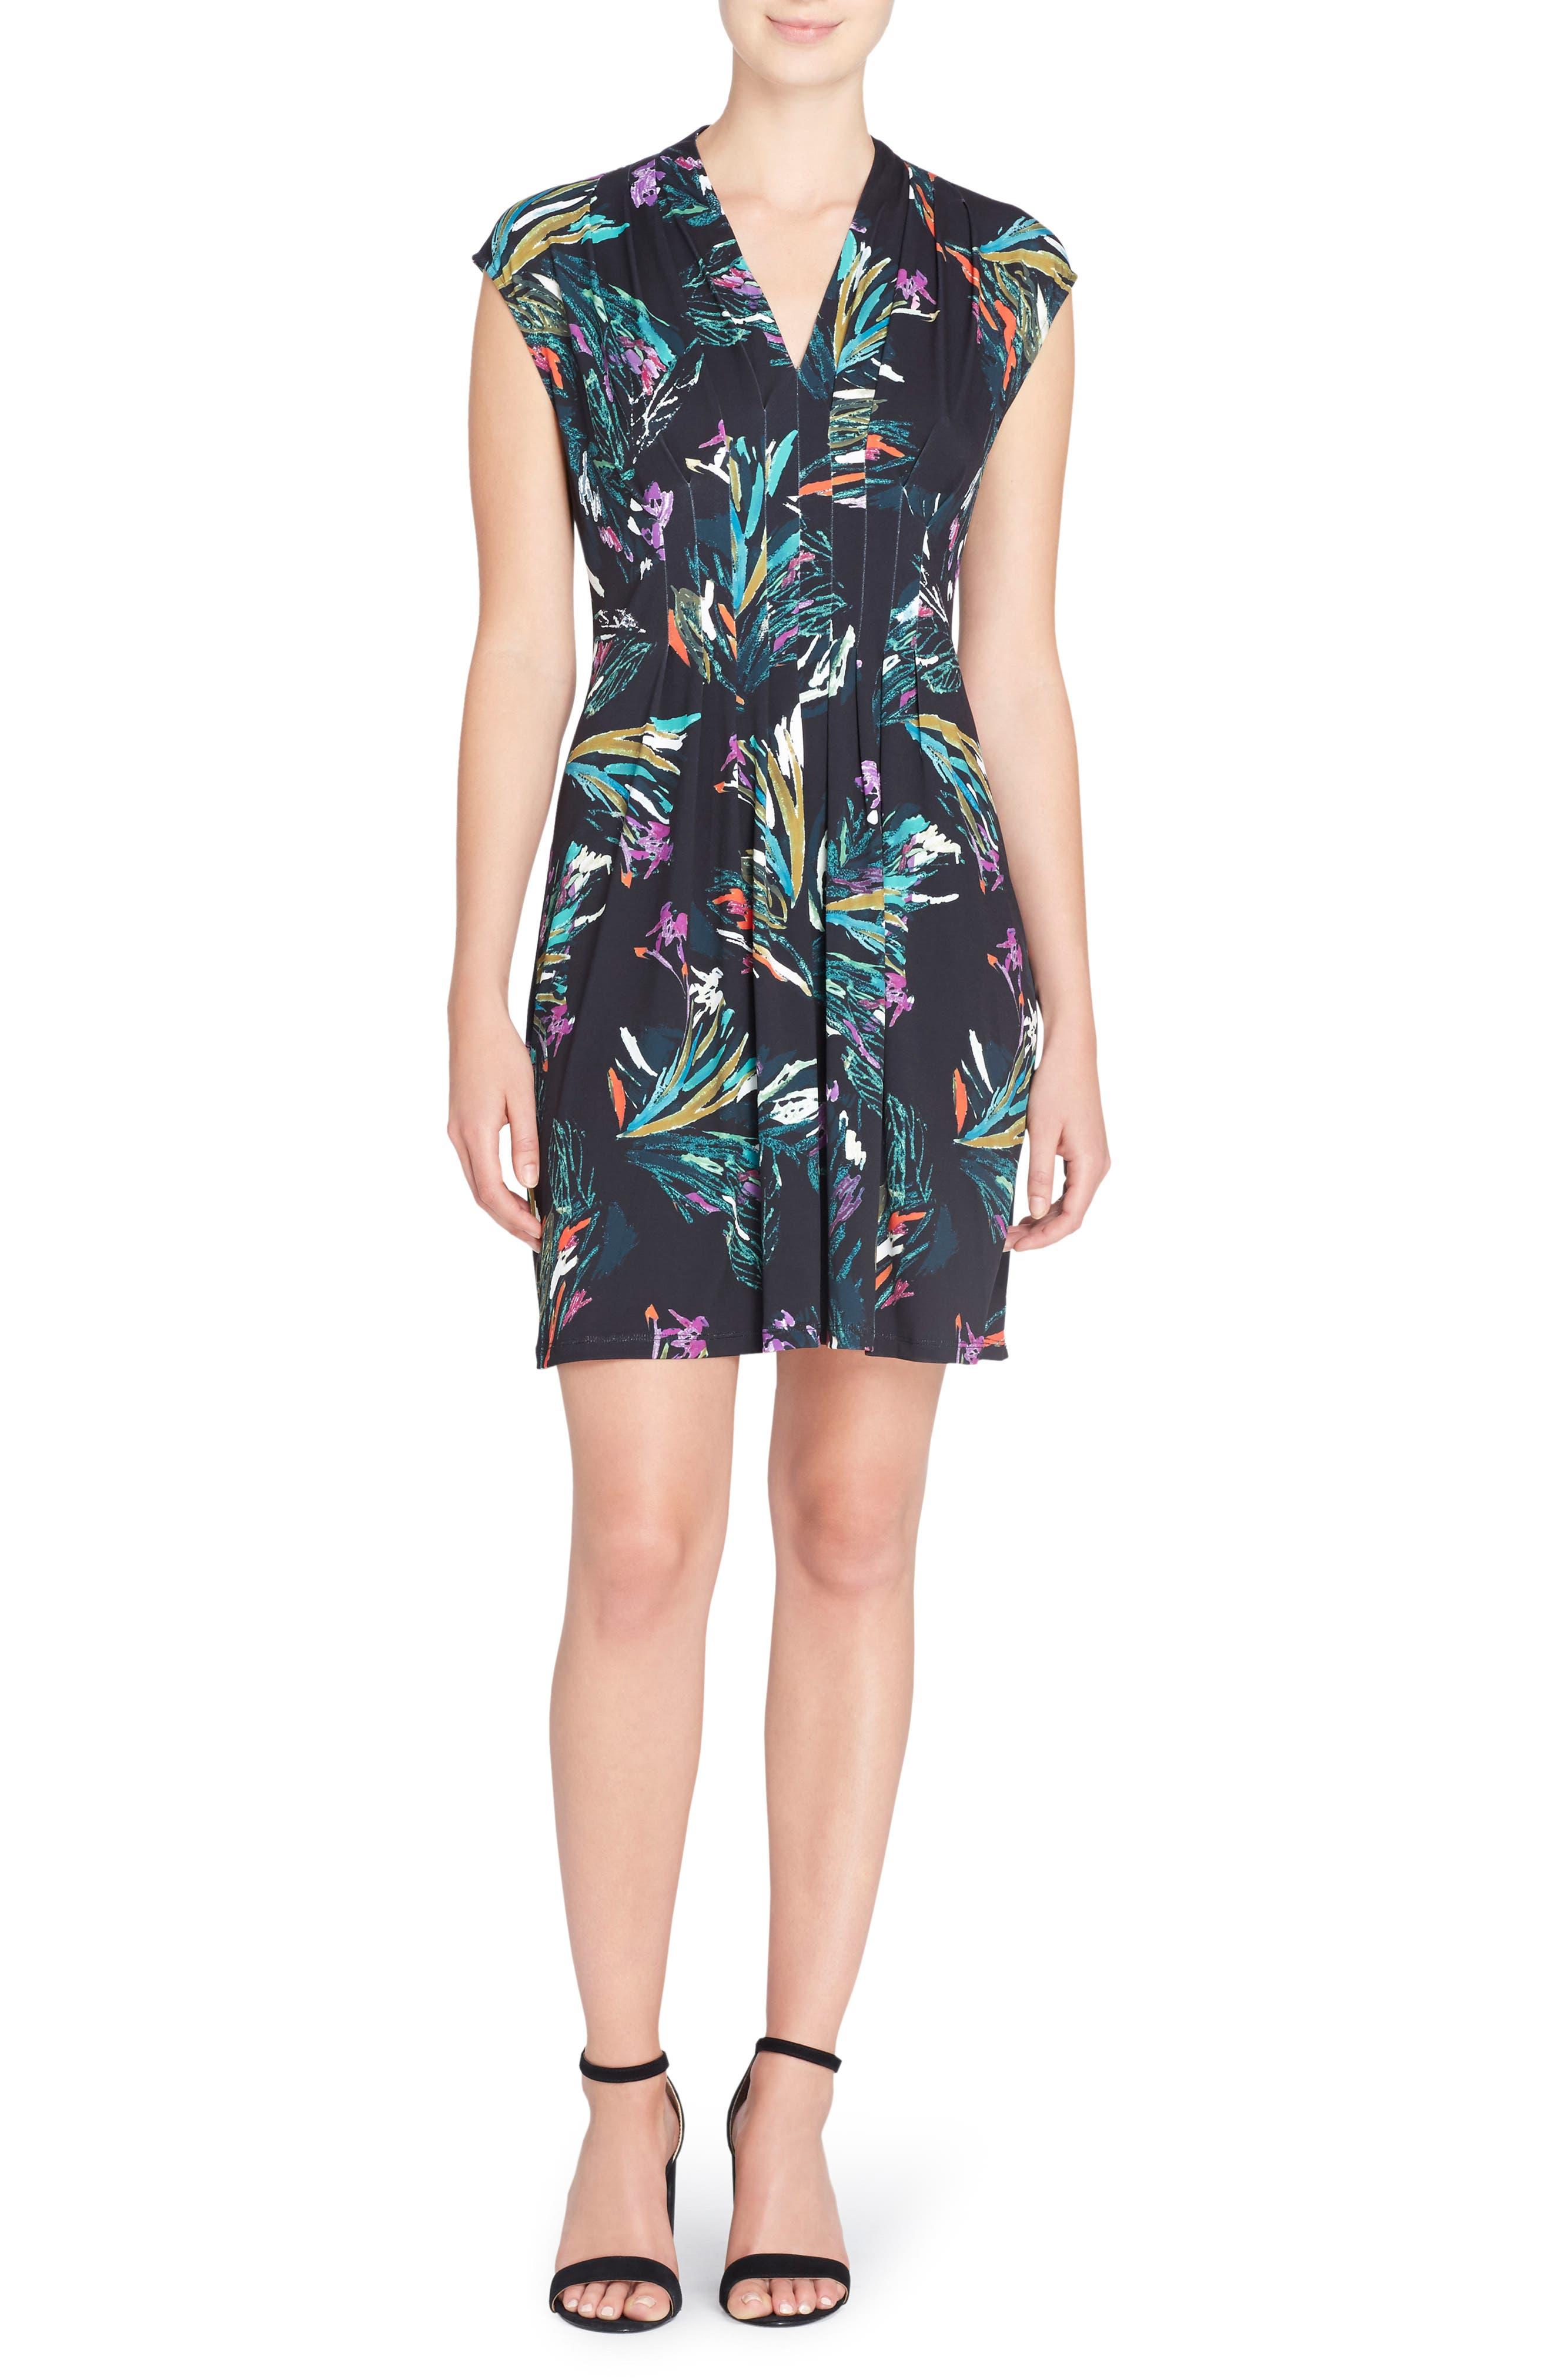 Catherine Catherine Malandrino Tinka Floral Print Fit & Flare Dress